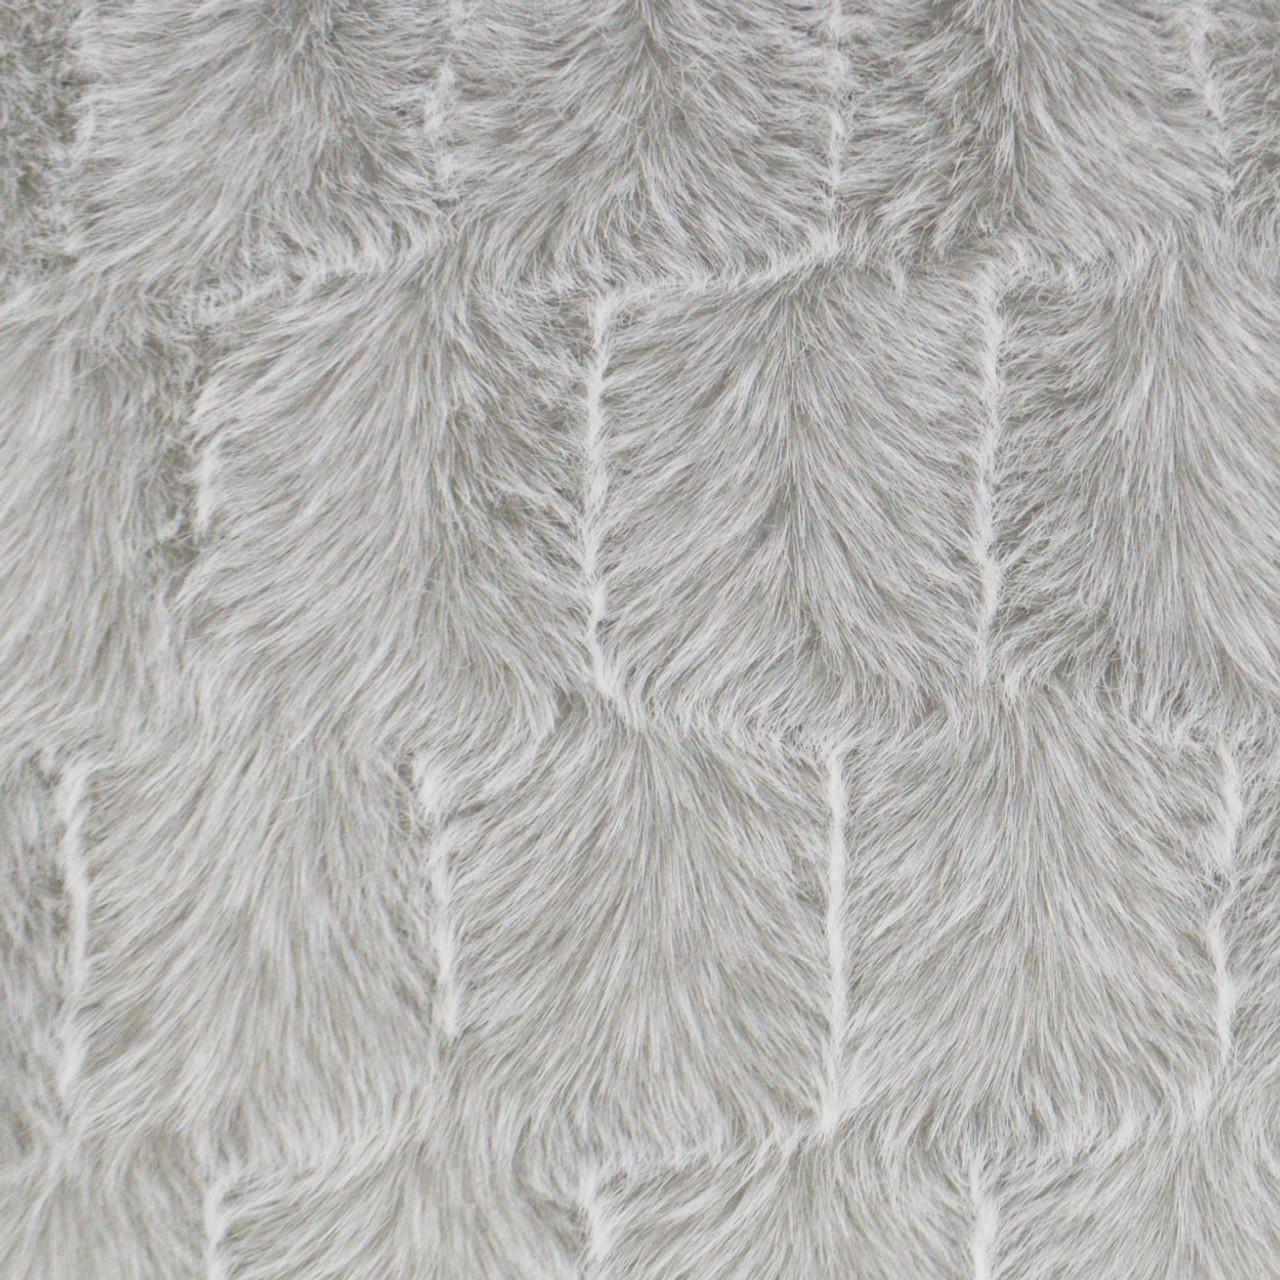 Ermelo Faux Fur Throw Pillow